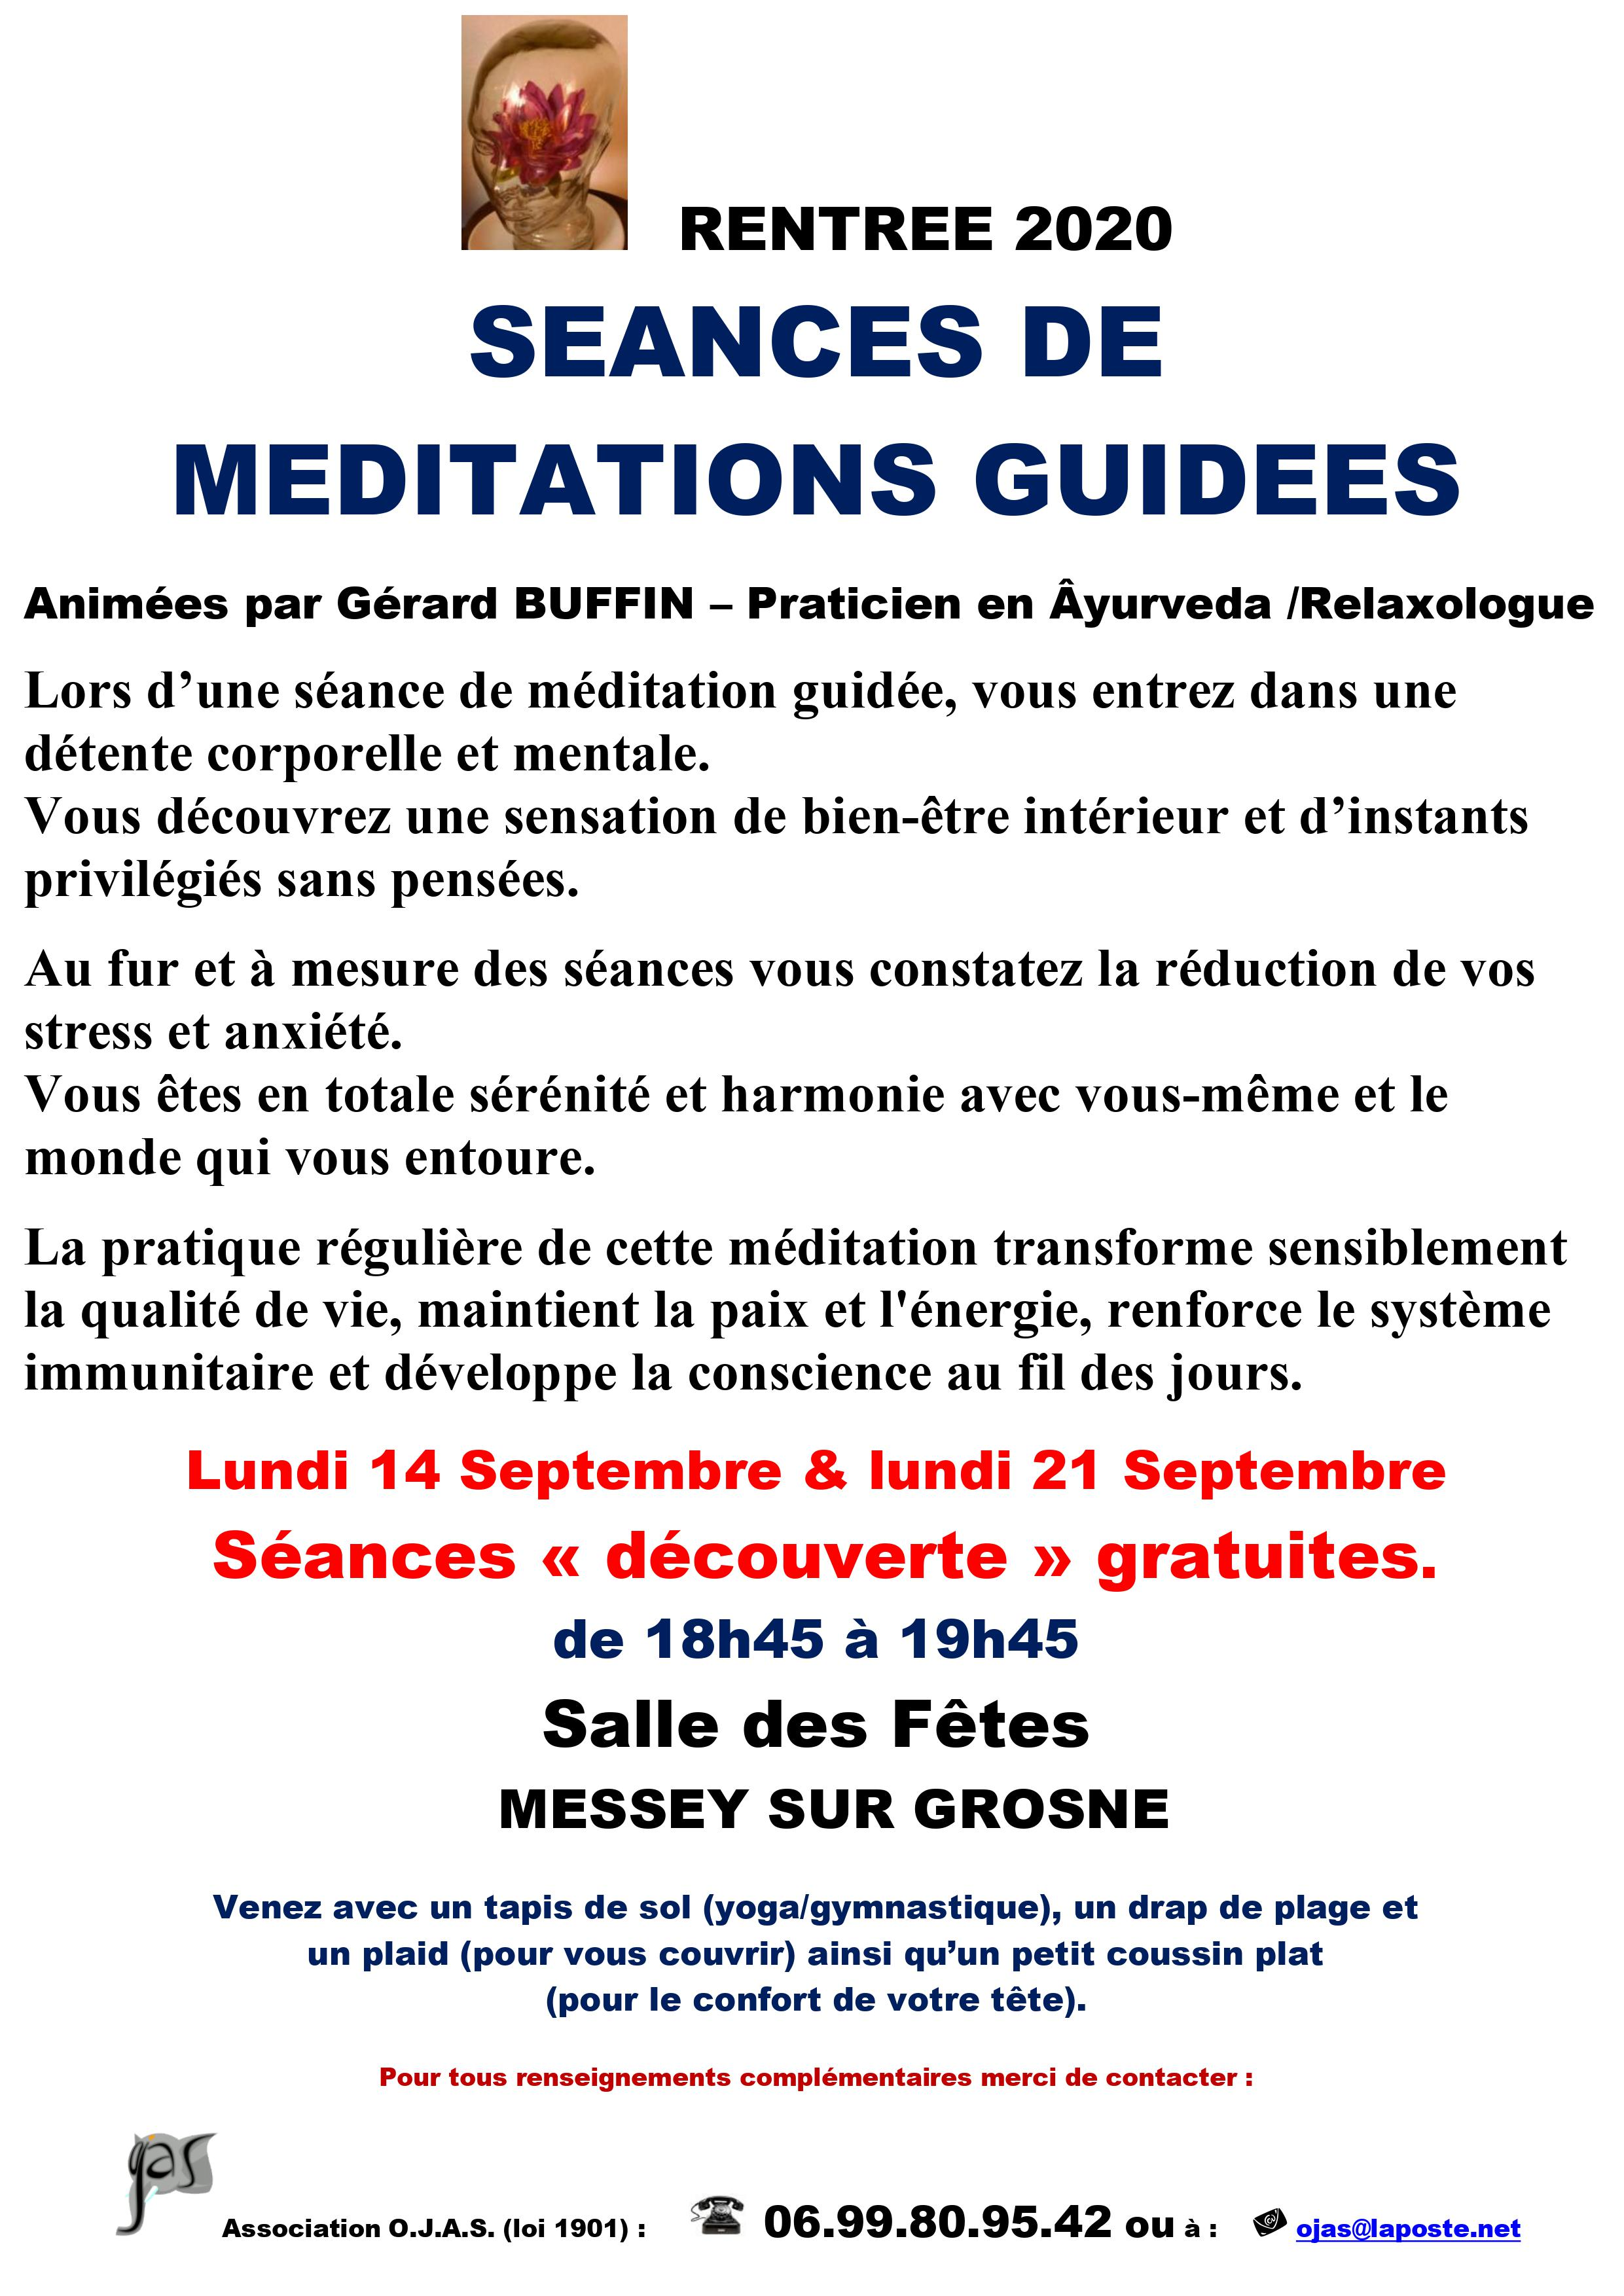 AFFICHETTE RENTREE 2020 MEDITATION